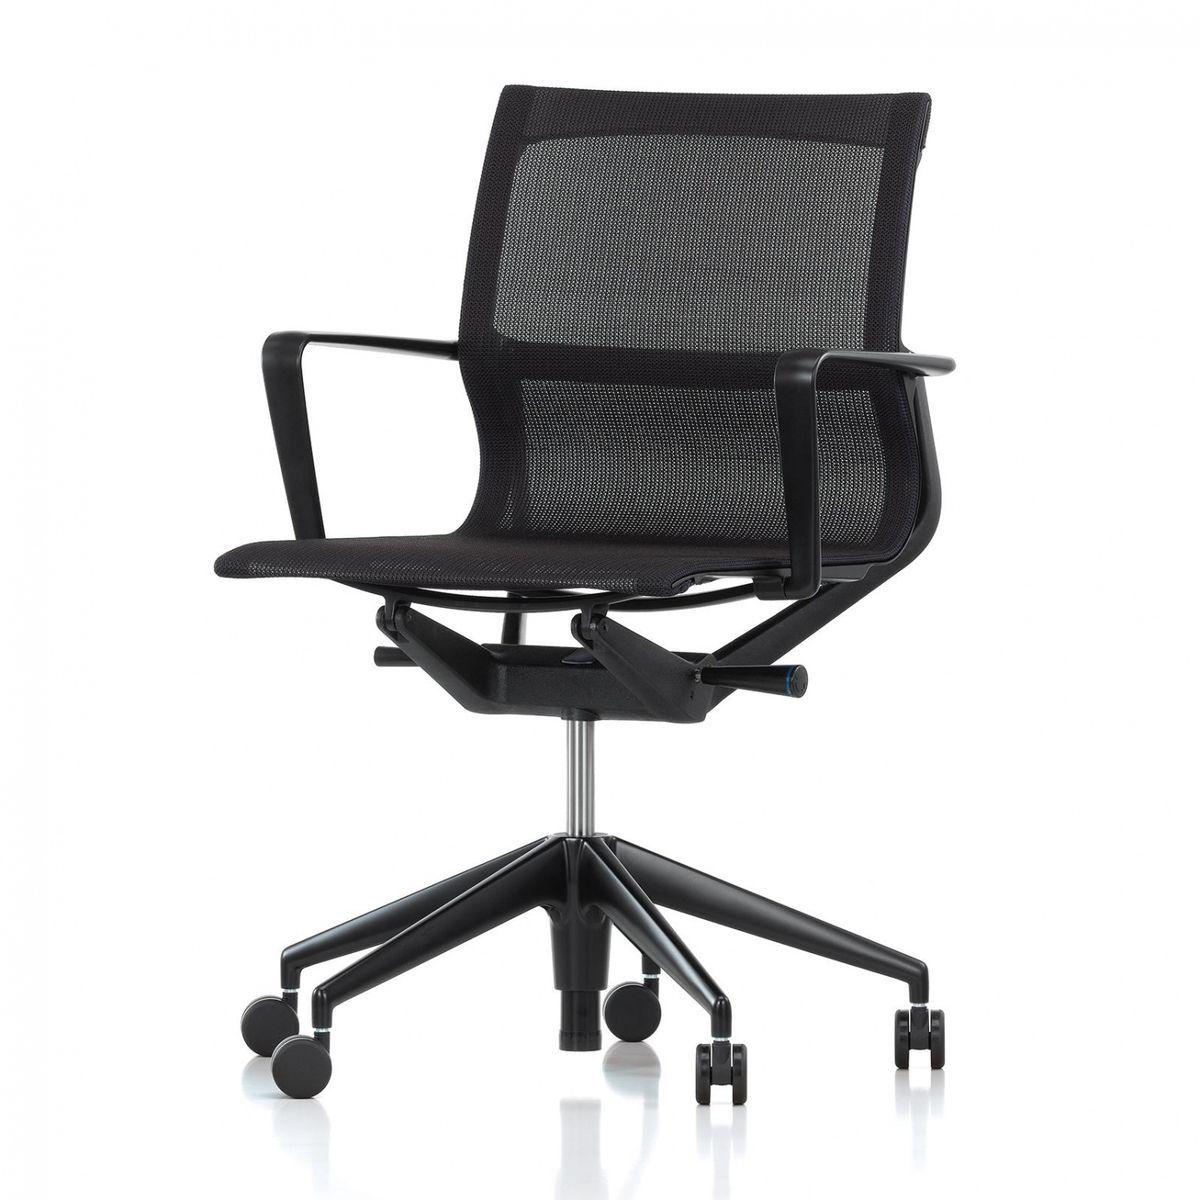 Bürostuhl Vitra vitra physix meda bürostuhl black pearl schwarz stoff trioknit